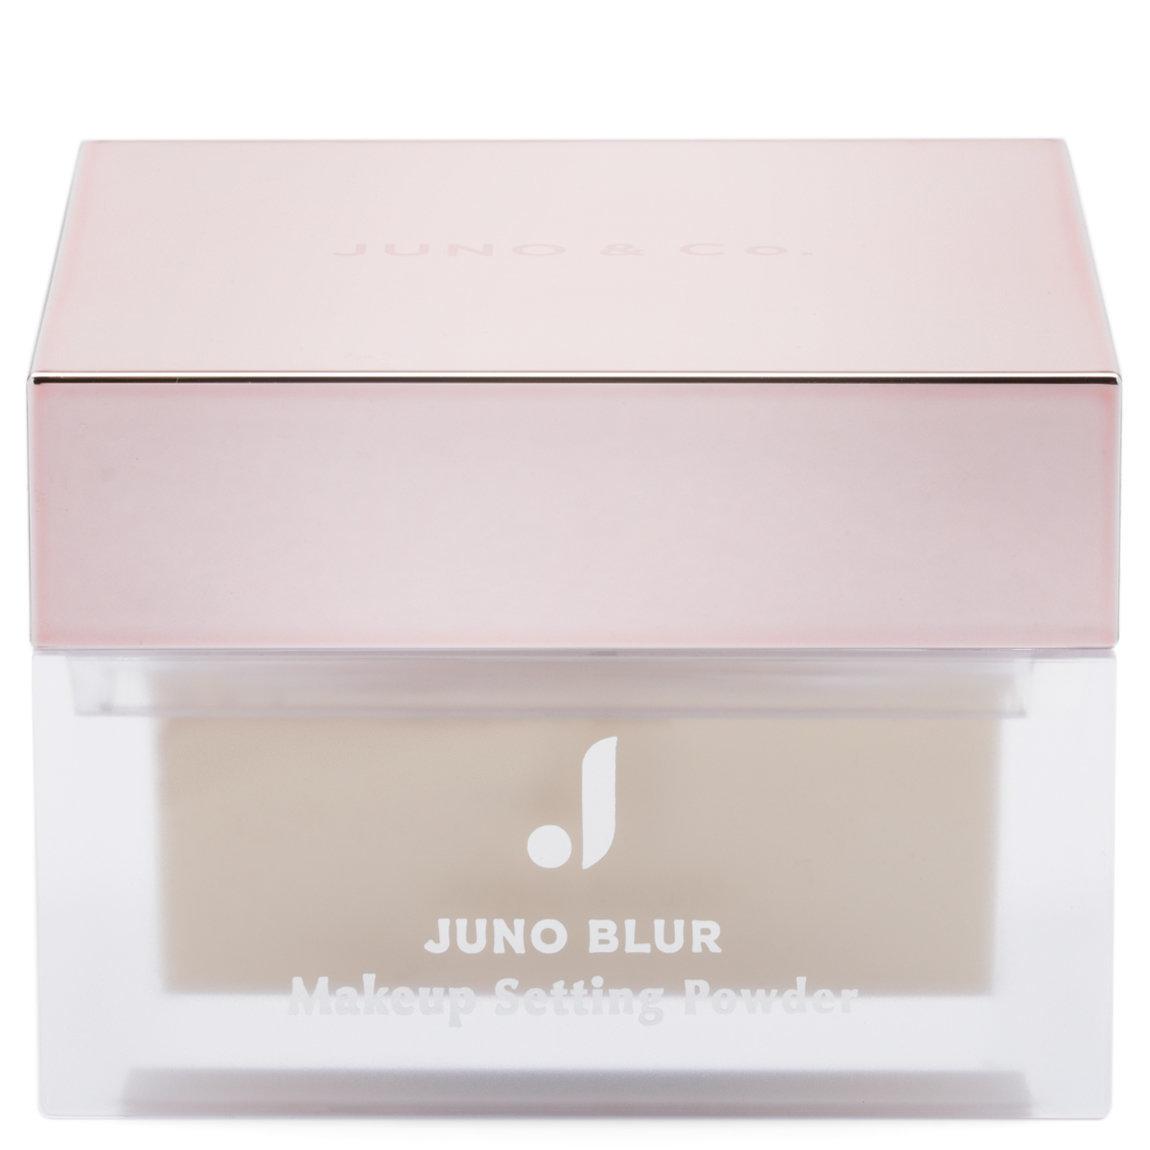 JUNO & Co. Juno Blur Makeup Setting Powder - Brightening alternative view 1 - product swatch.